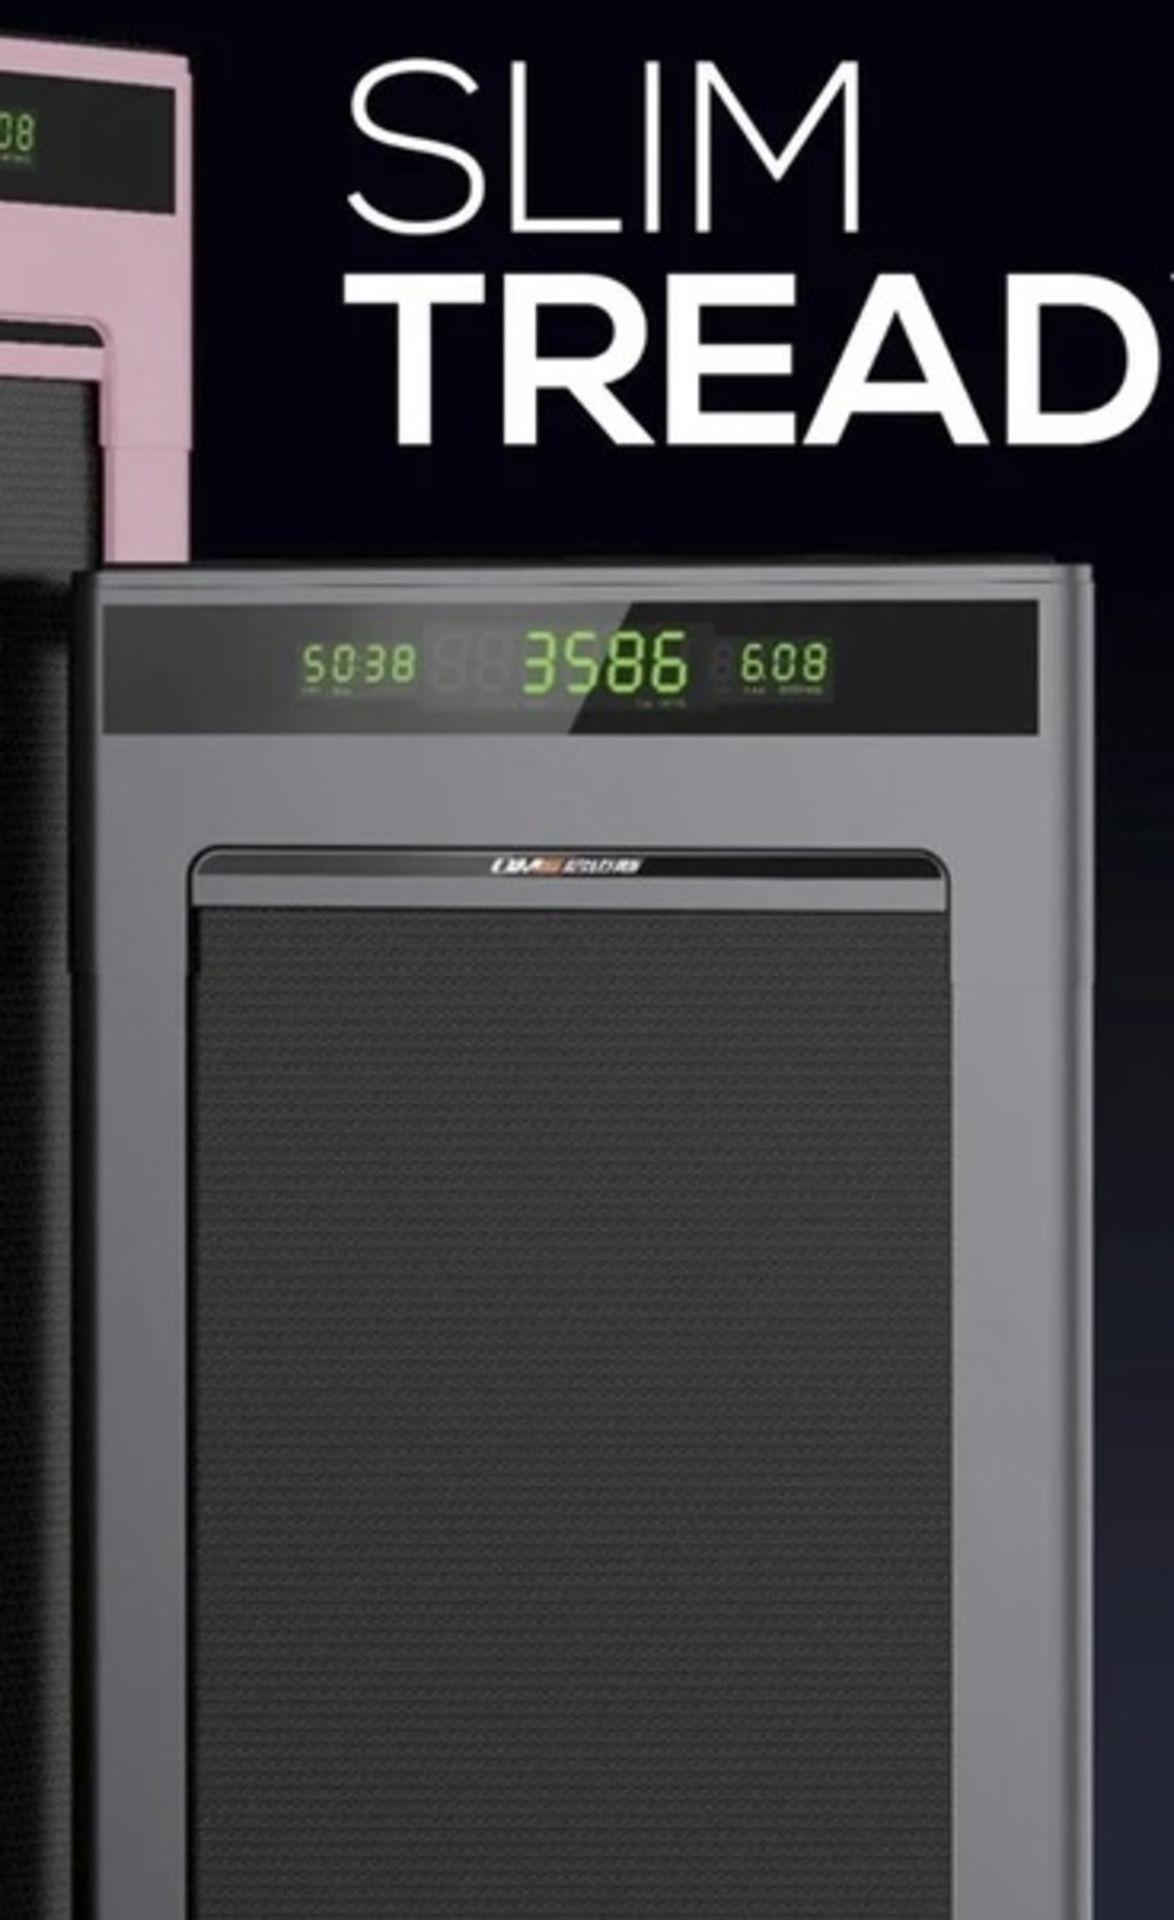 1 x Slim Tread Ultra Thin Smart Treadmill Running / Walking Machine - Lightweight With Folding - Image 9 of 23